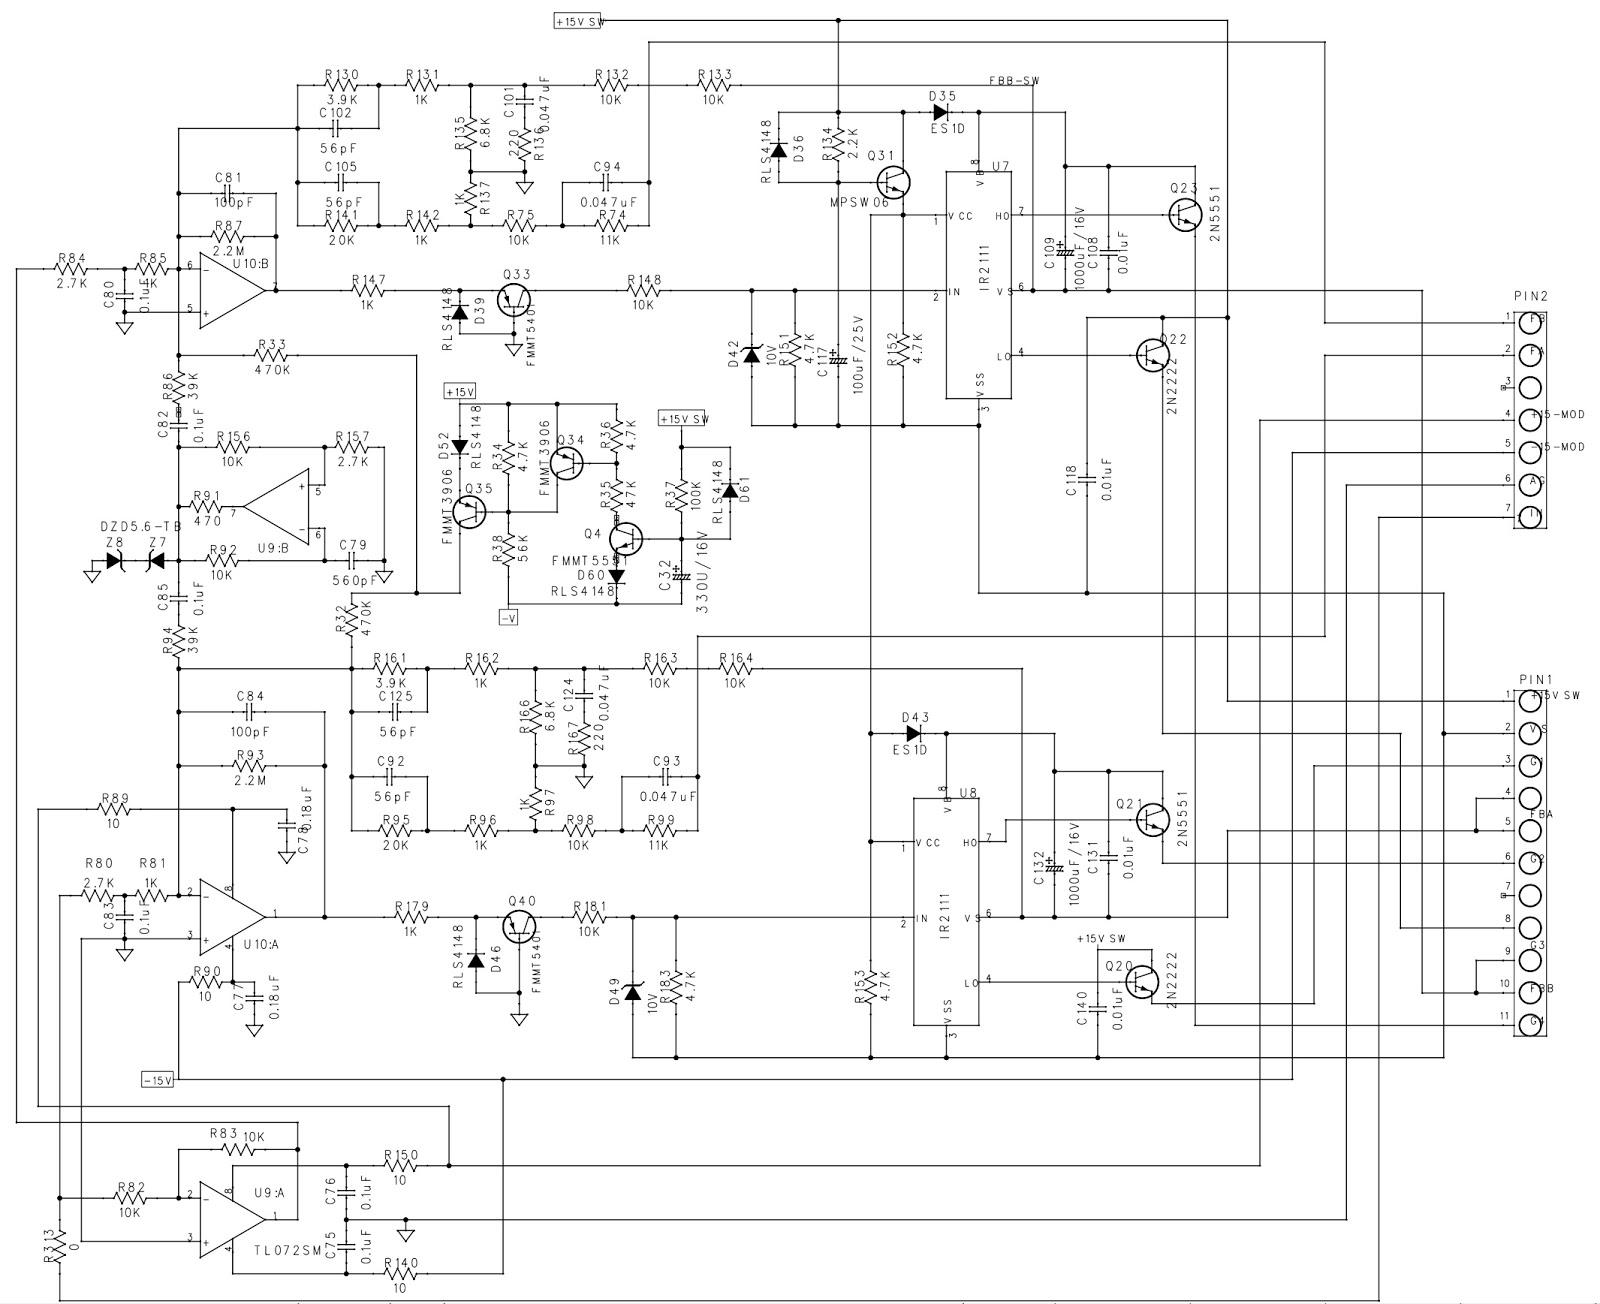 jbl powered subwoofer schematic diagram wiring diagram data val jbl powered subwoofer schematic diagram [ 1600 x 1304 Pixel ]